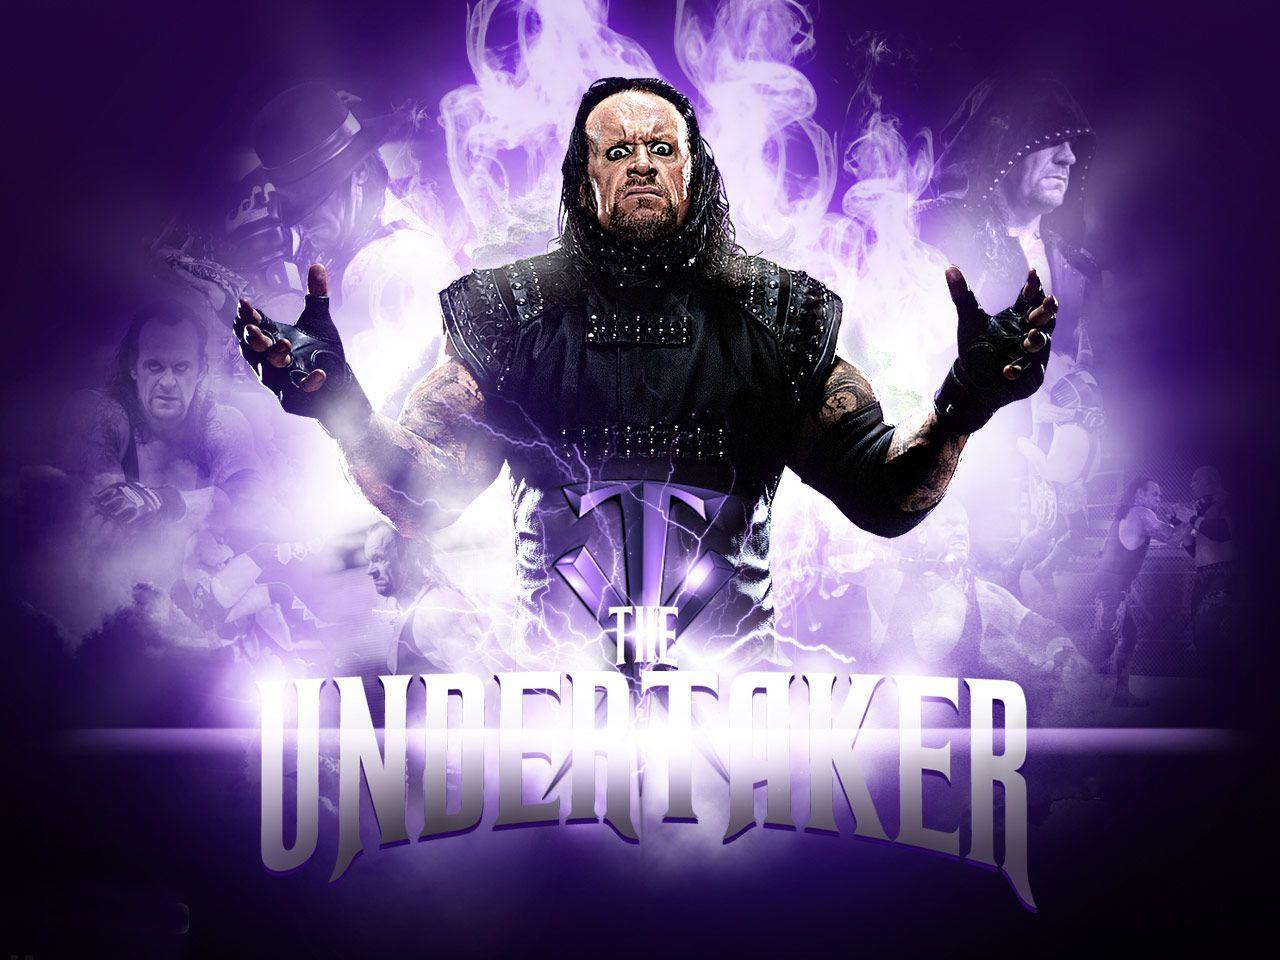 Wwe Wallpapers The Undertaker Undertaker Wallpapers Undertaker Wwe Undertaker Wwe